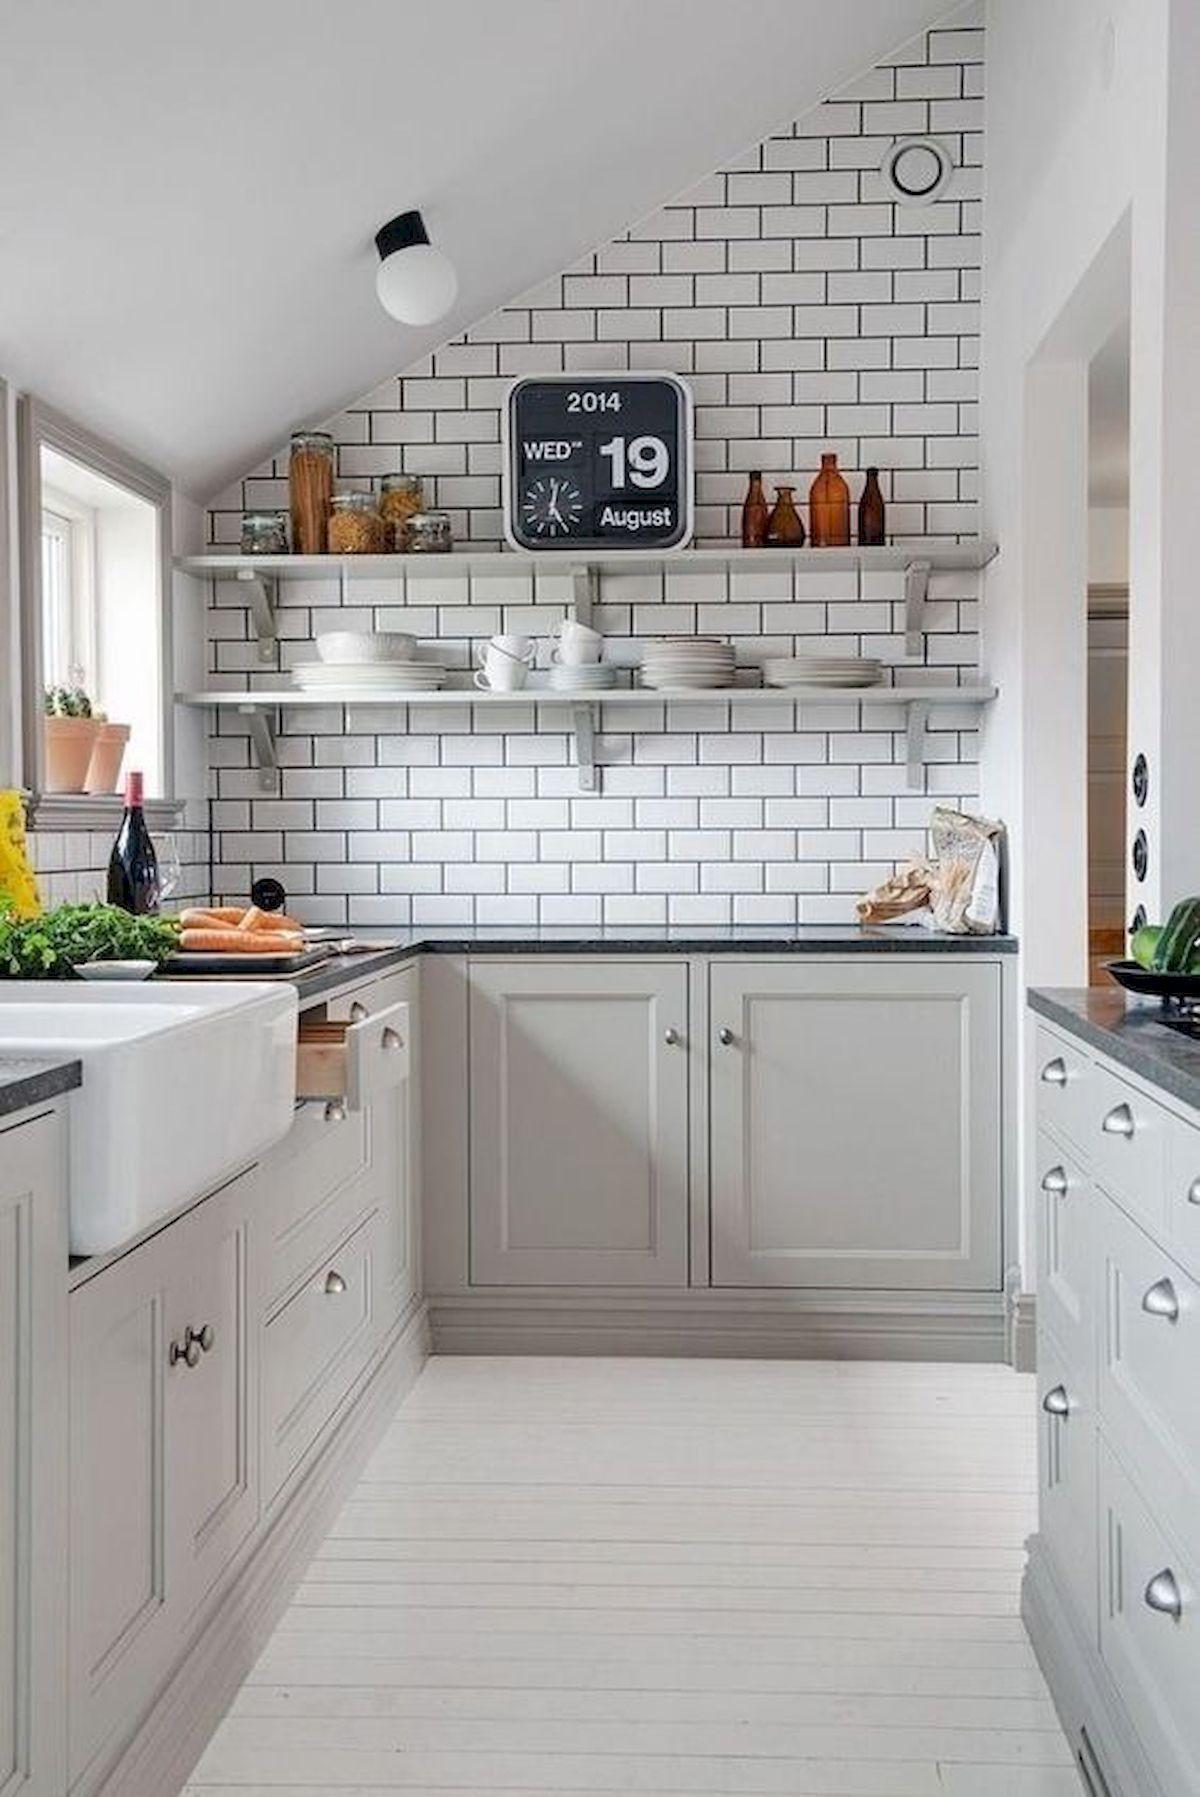 Best Small Kitchen Design Ideas Small Kitchen Inspiration